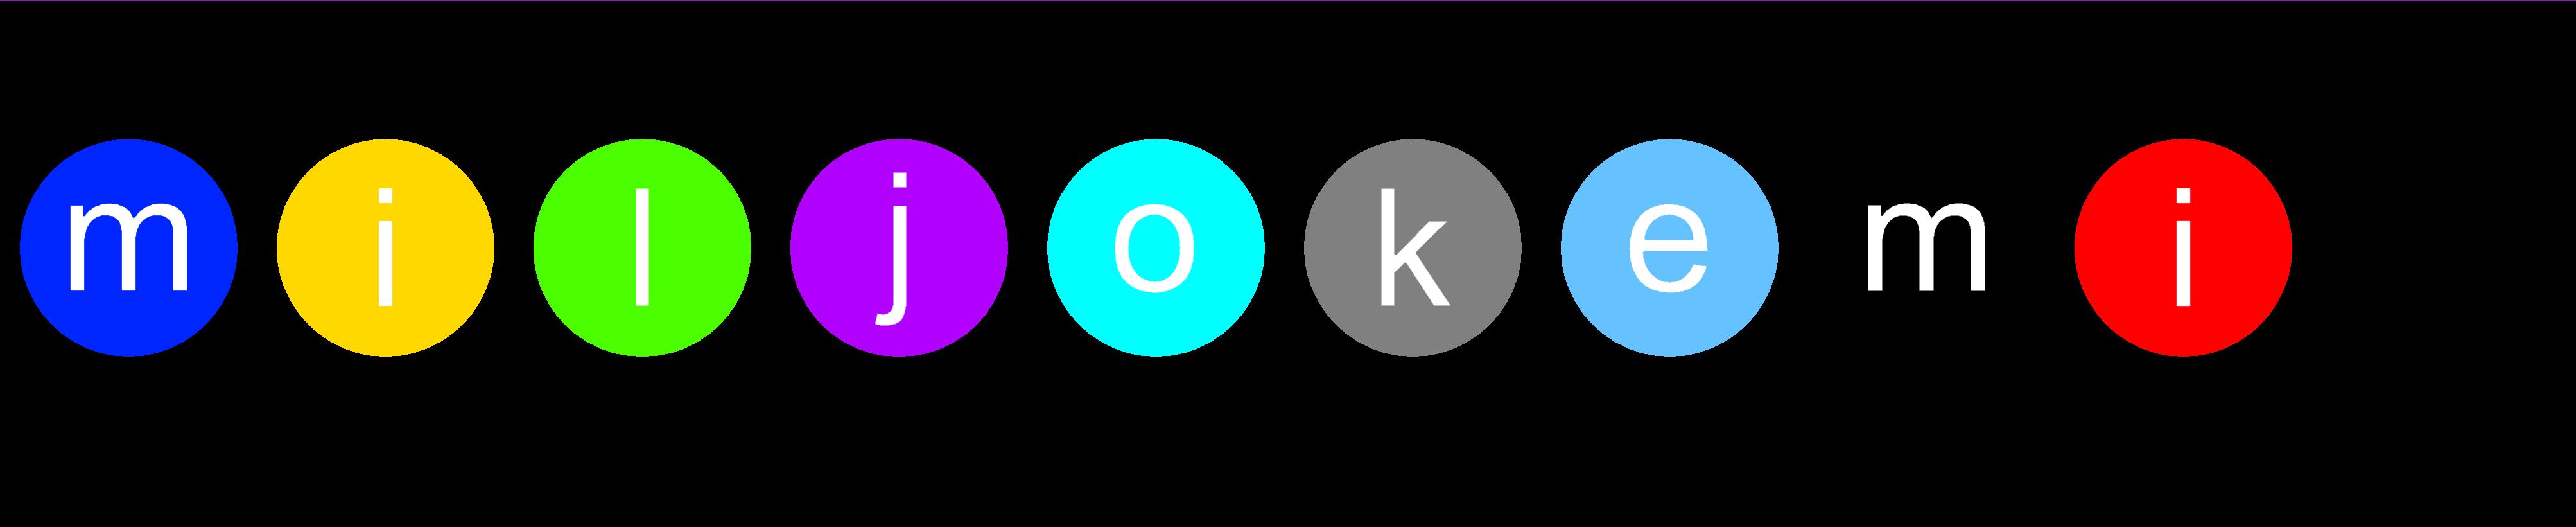 miljokemi.dk logo